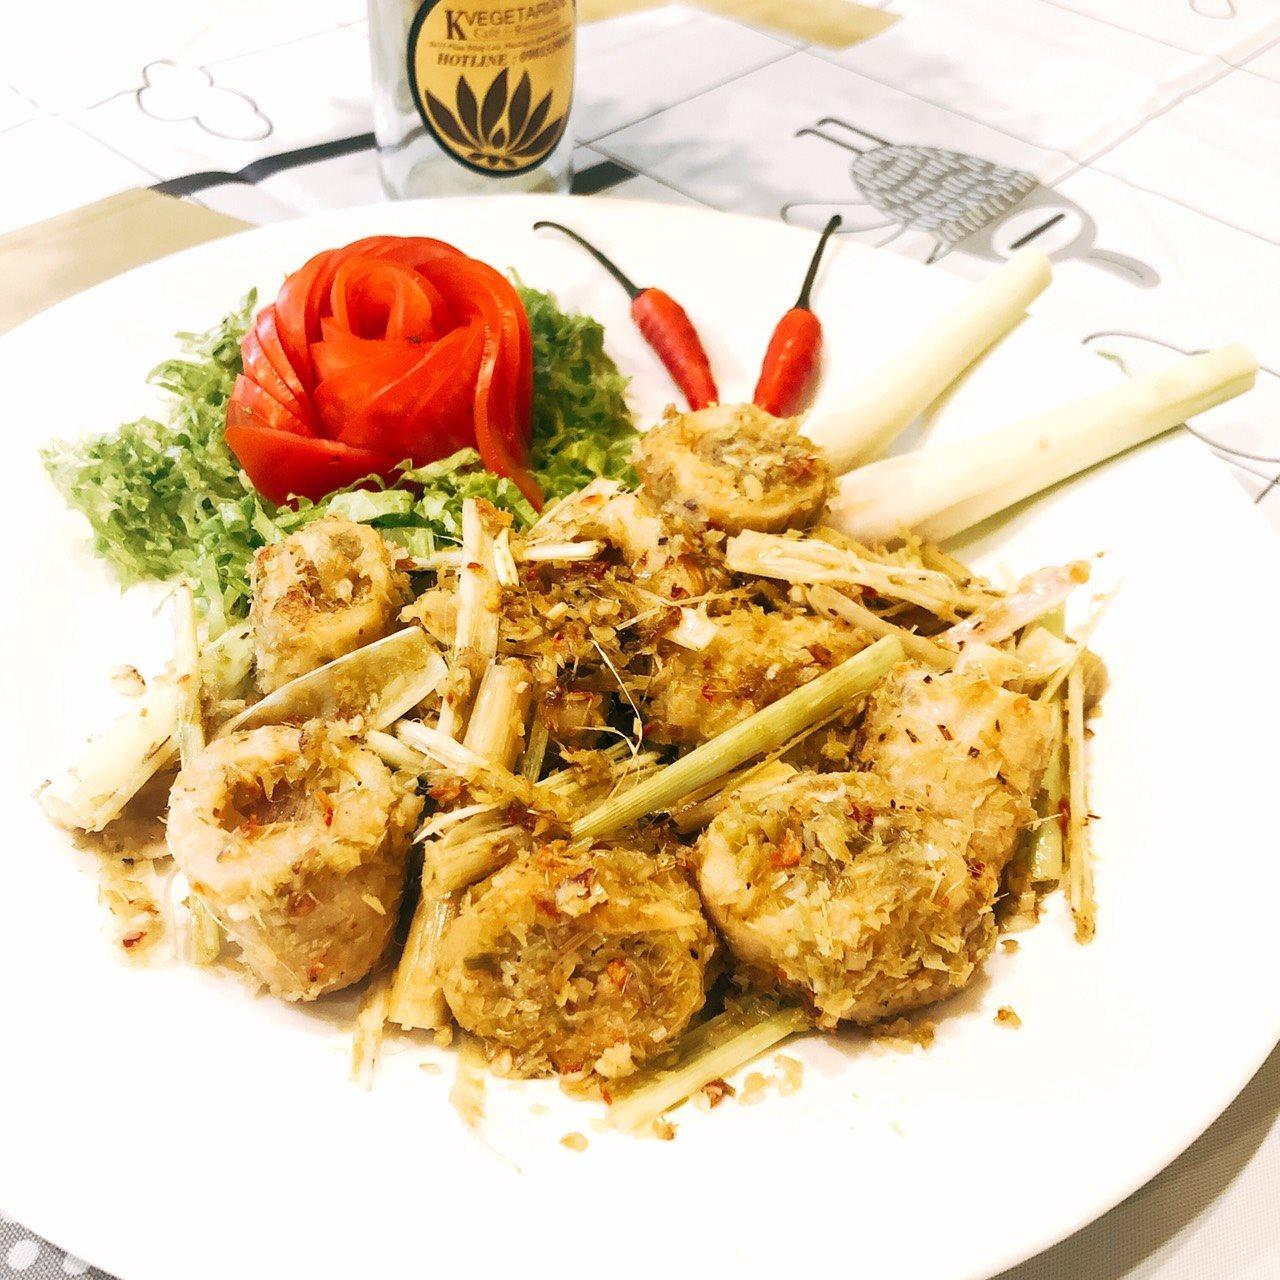 KVegetarian - Restaurant & Café - Buffet chay thanh tịnh